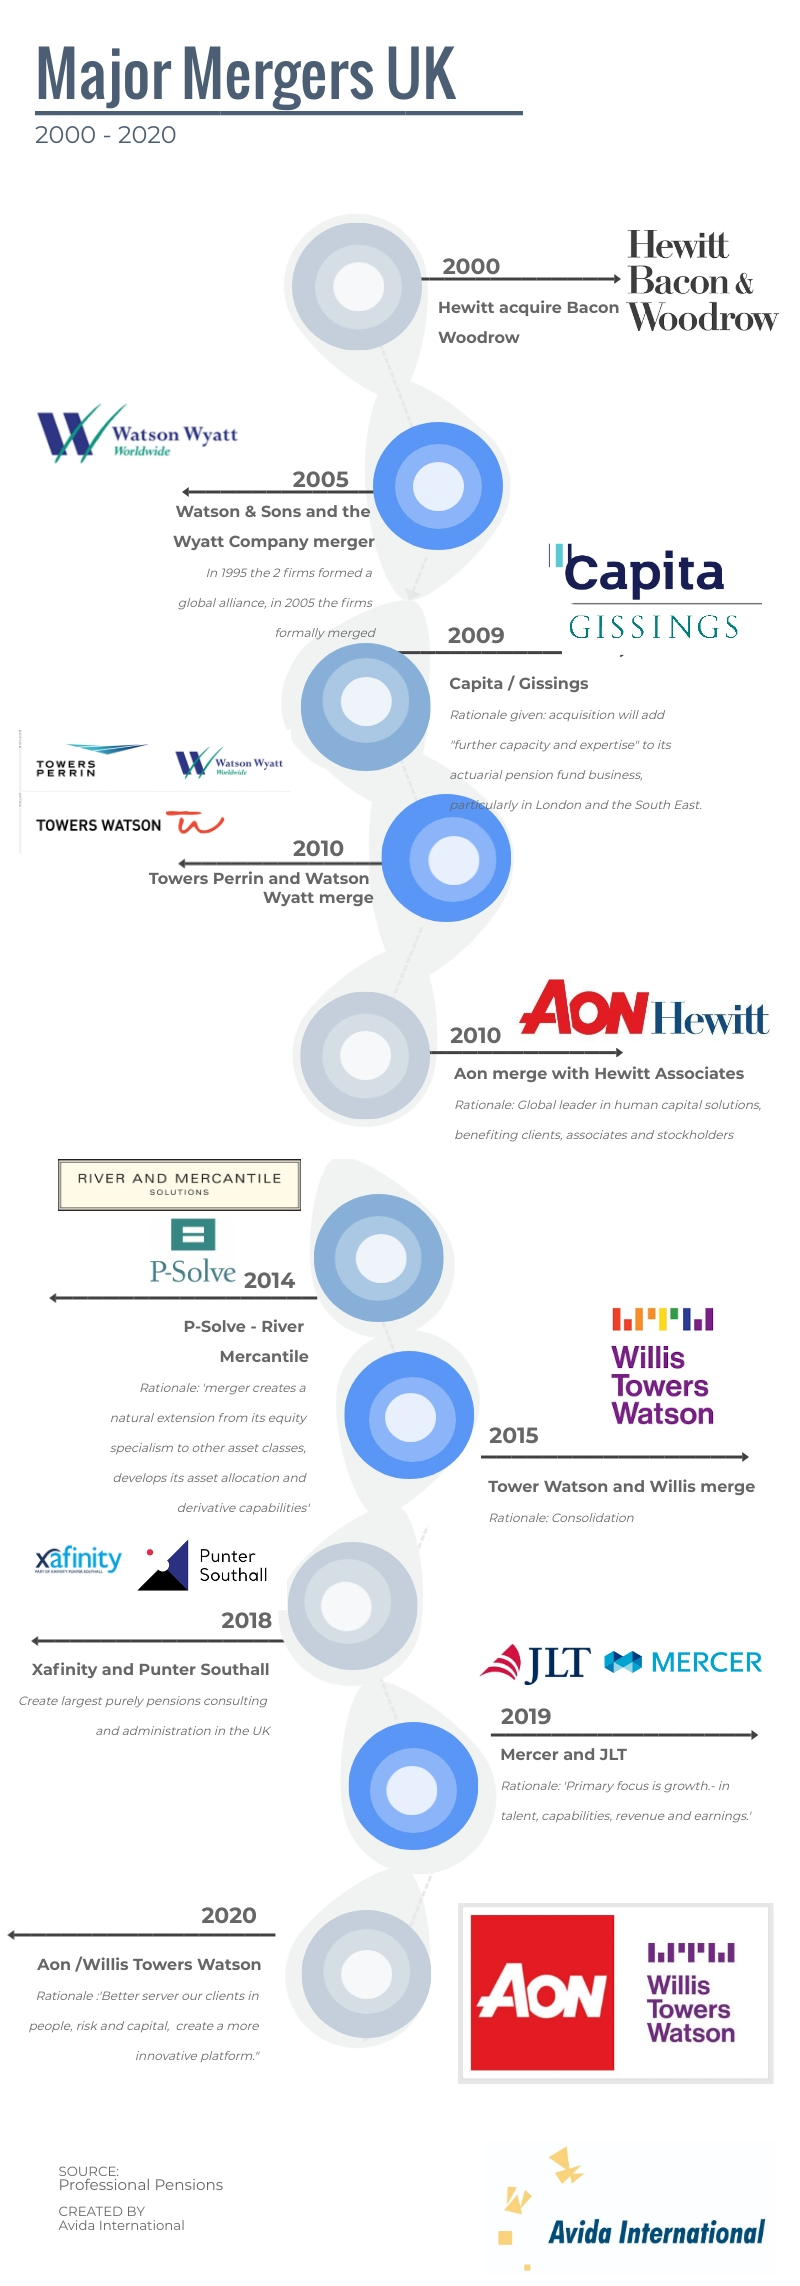 Major mergers UK pension advisors